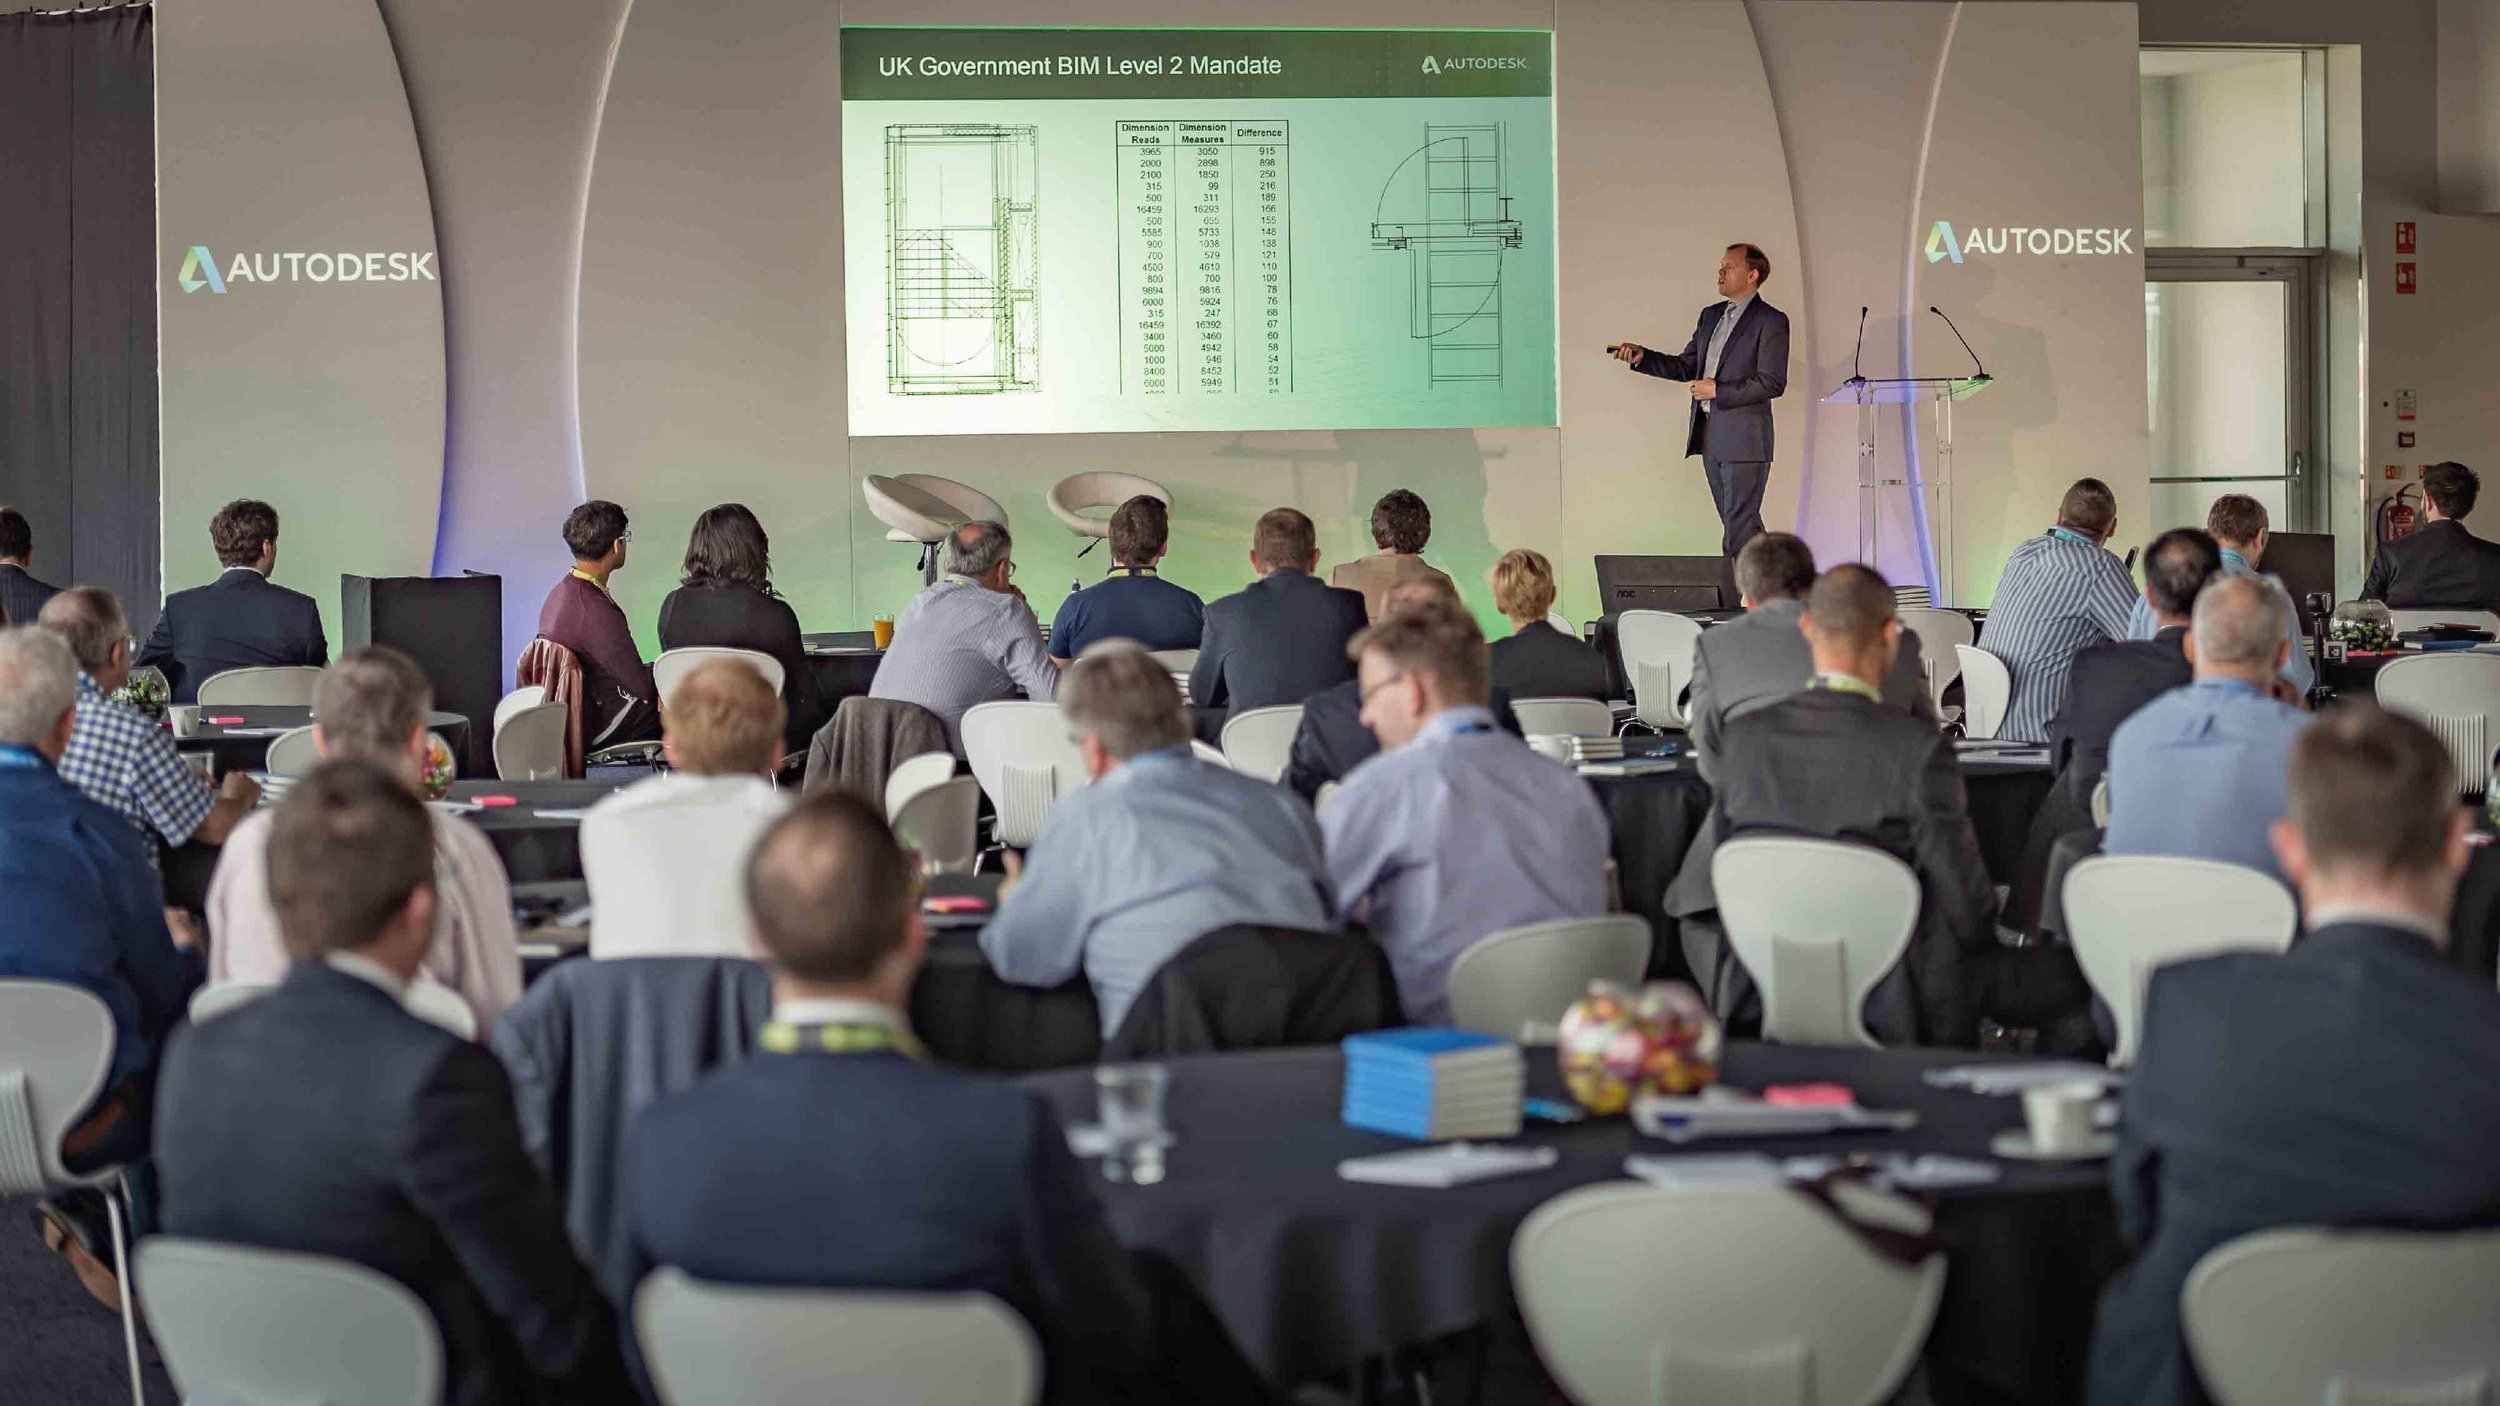 Autodesk Construction Event UK 2016-36.jpg